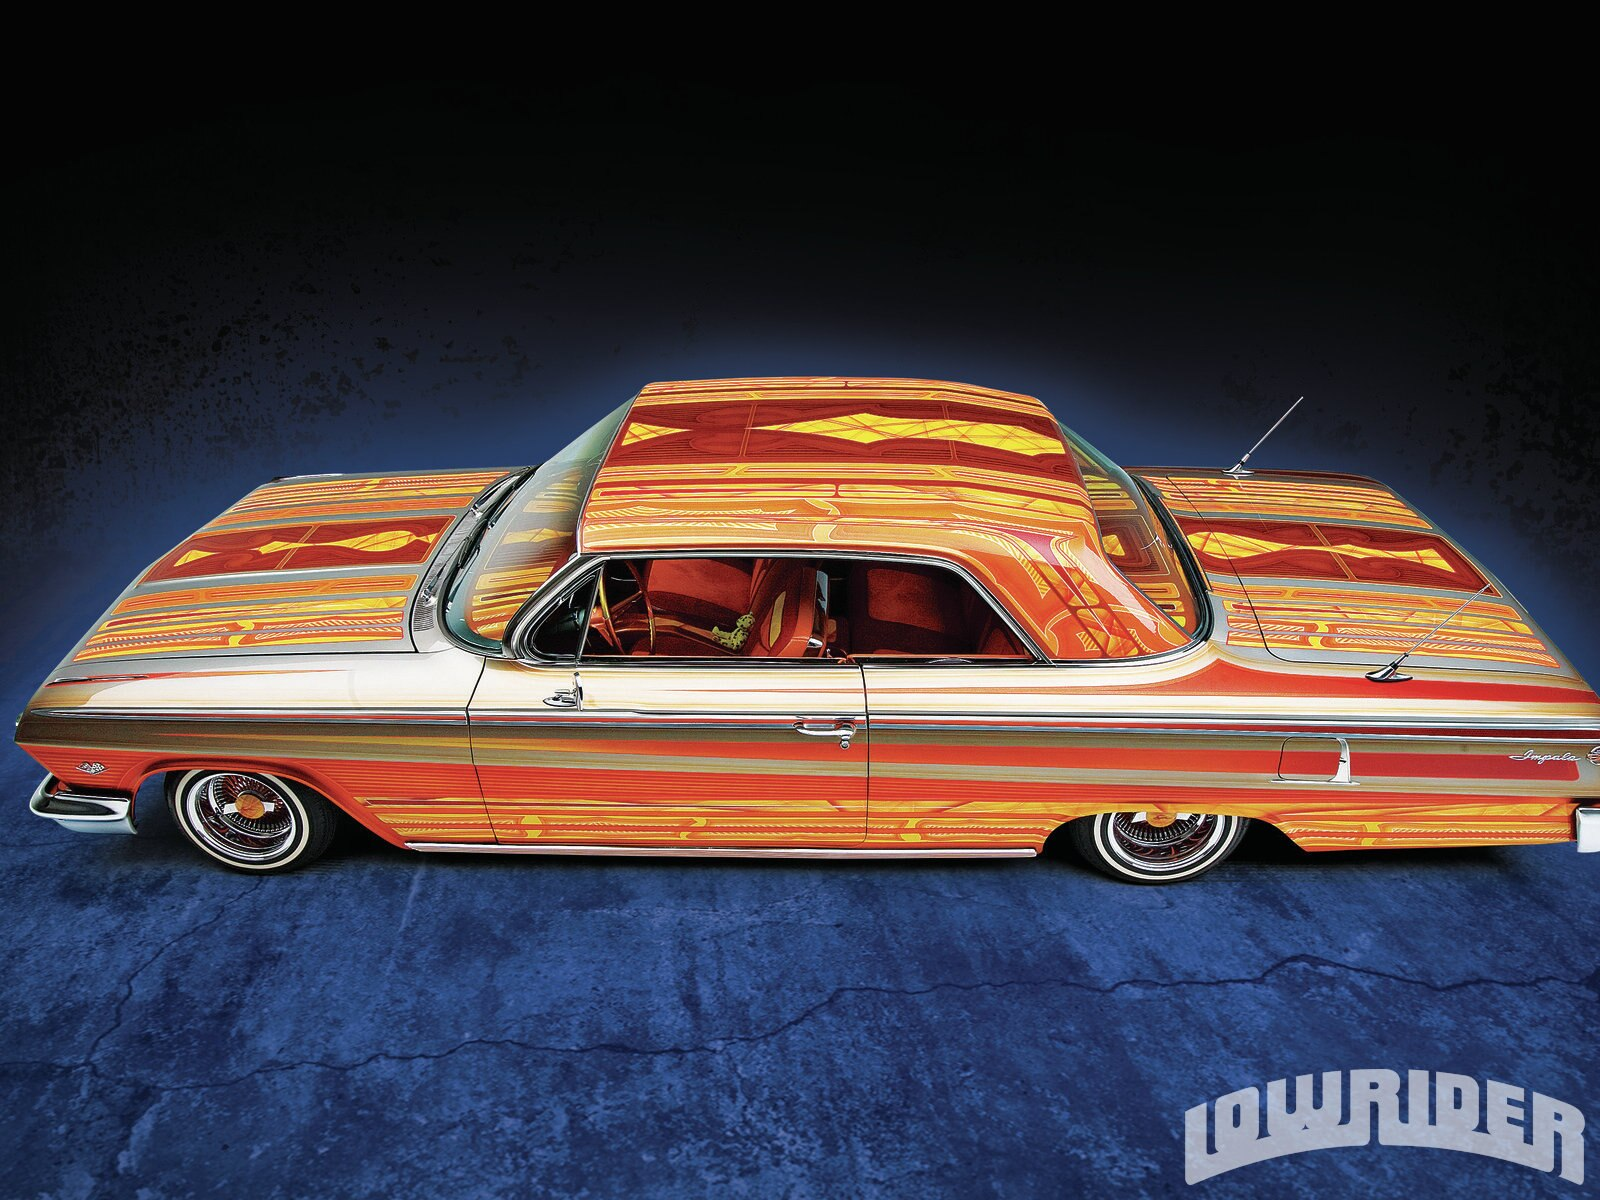 1109-lrmp-04-o-1962-chevrolet-impala-SS-driver-side-profile2